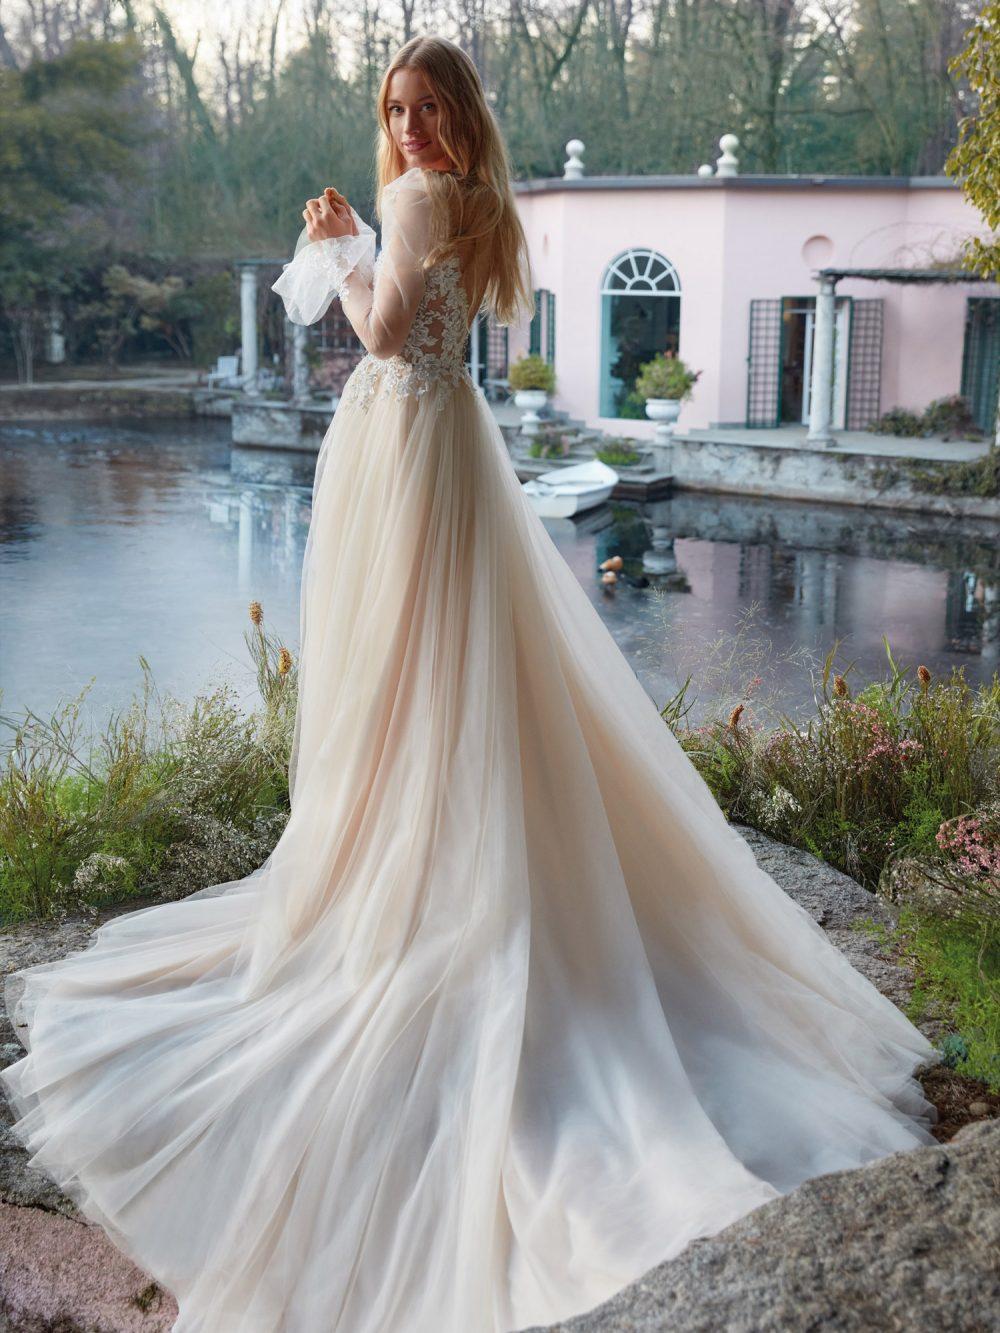 Colet 2022 abito vestito sposa Vicenza HOYA